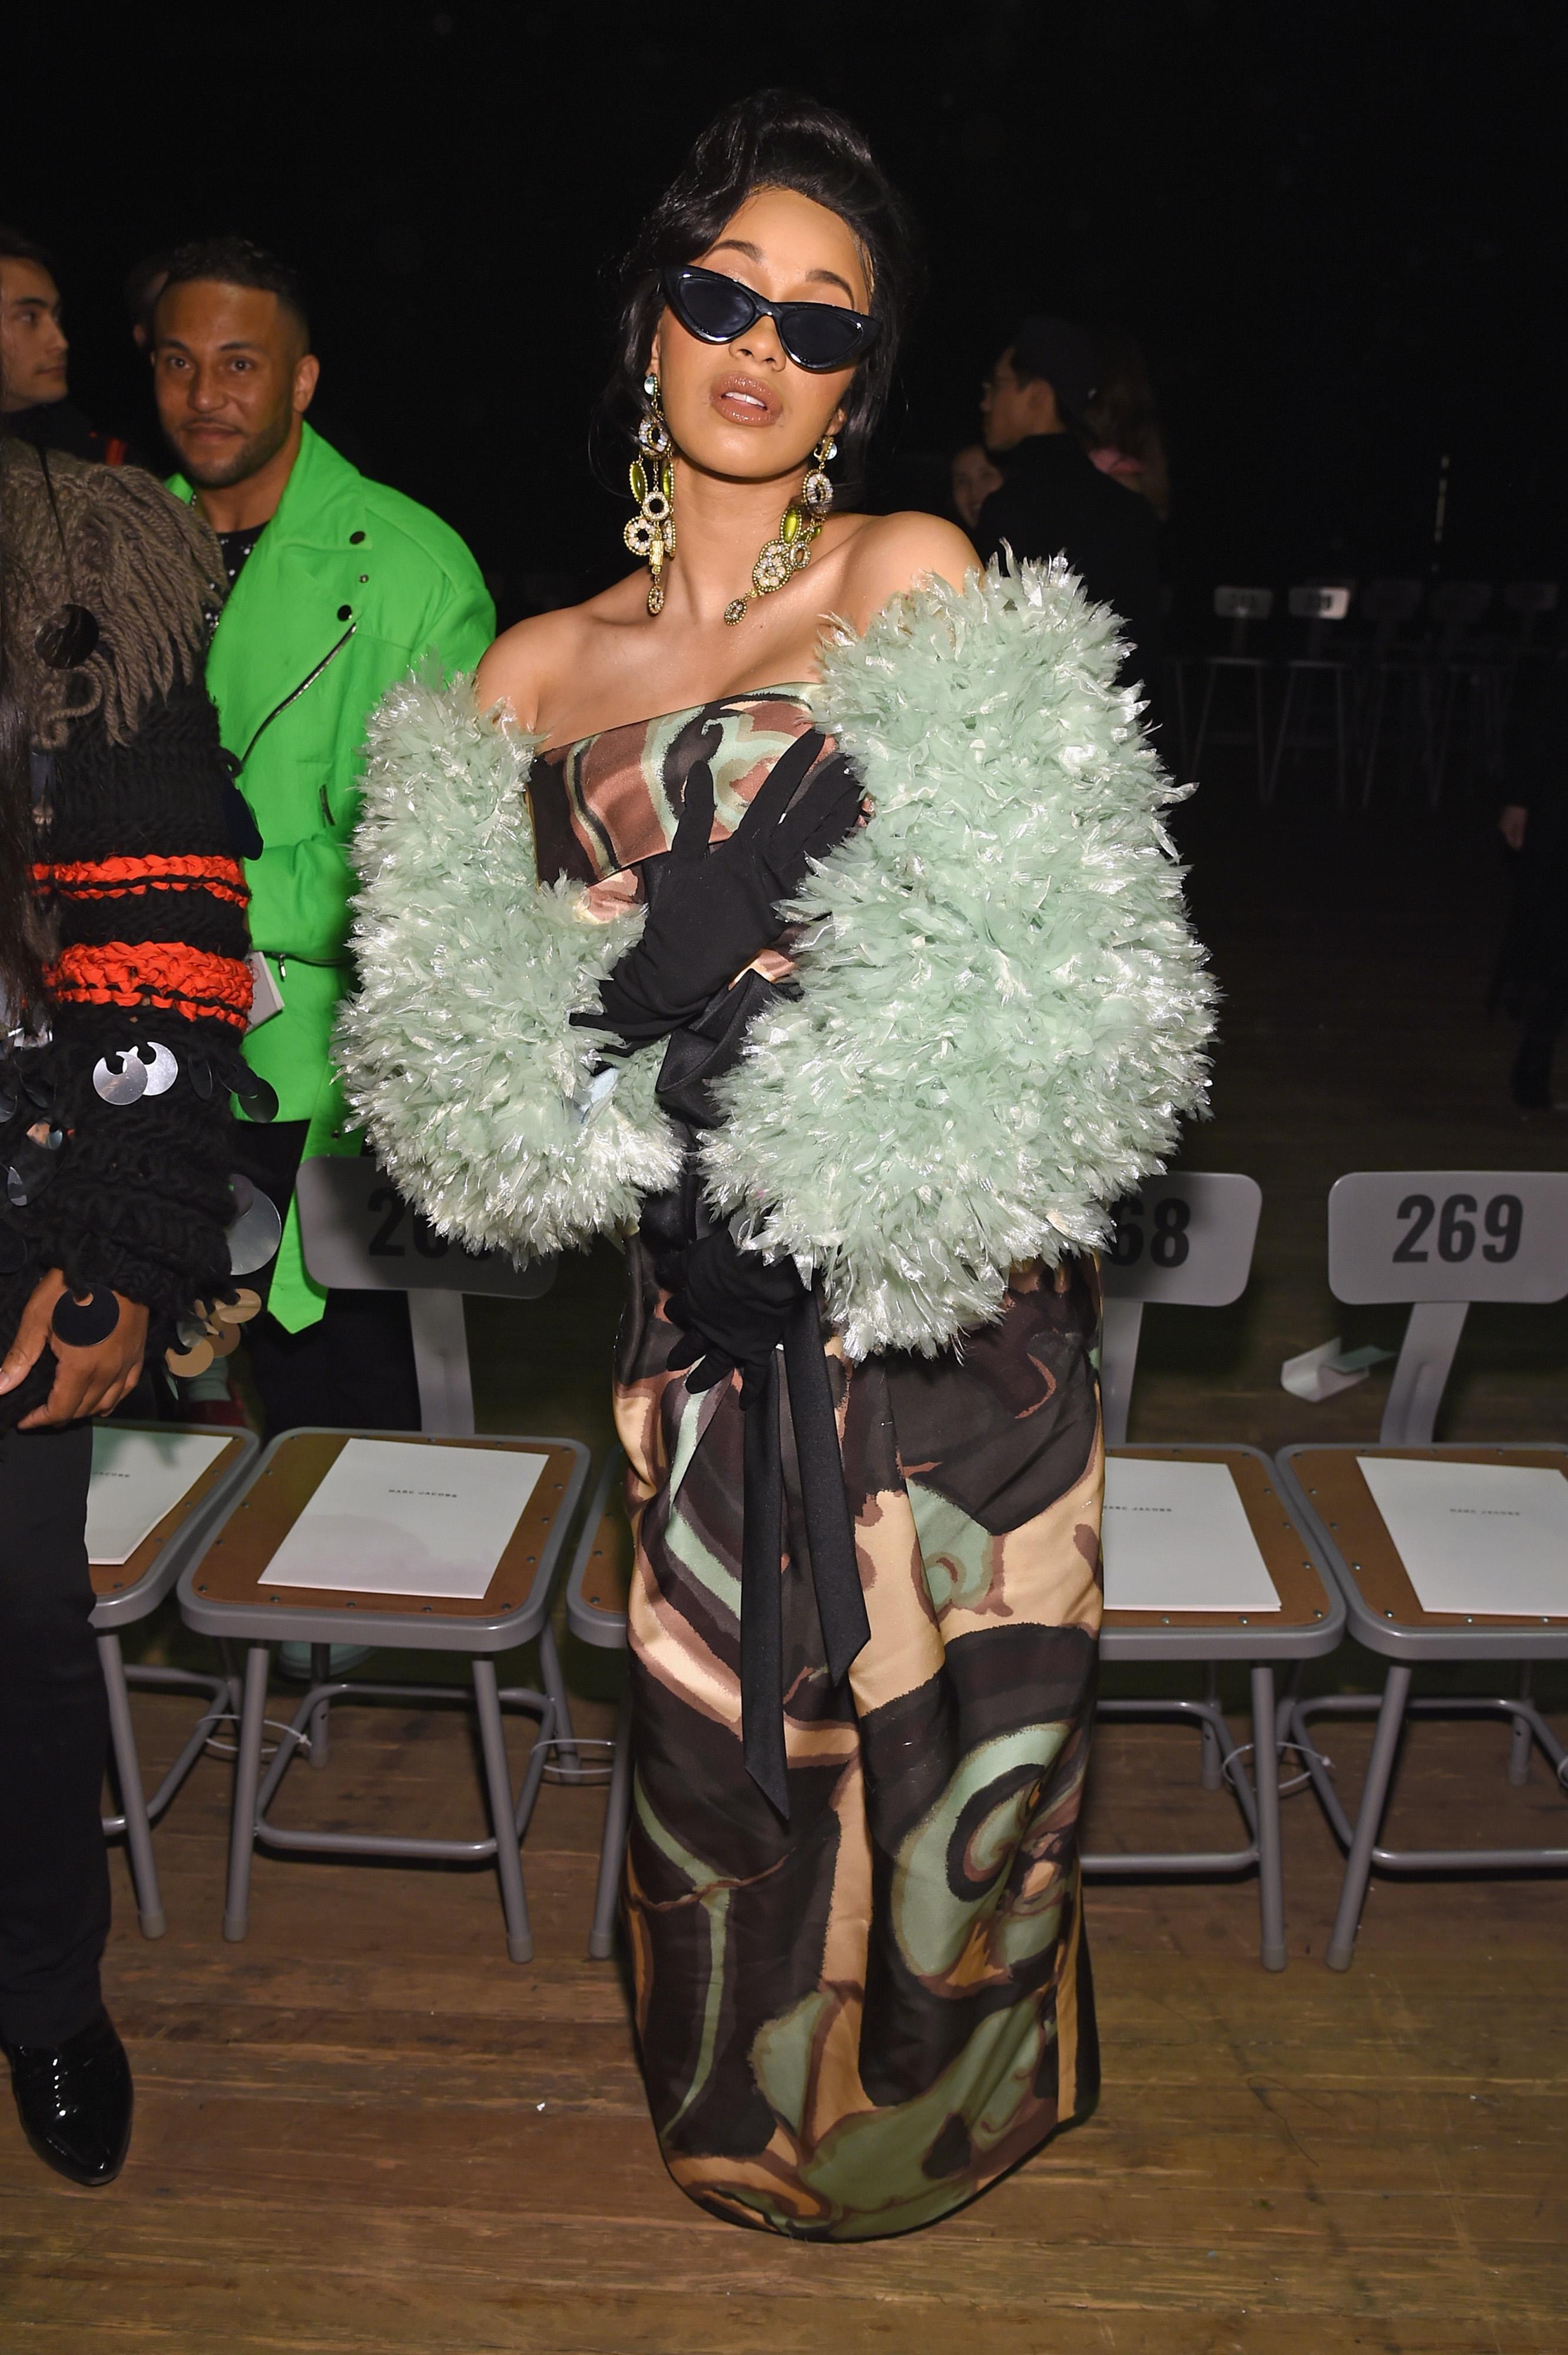 fashion week, famosas, front row